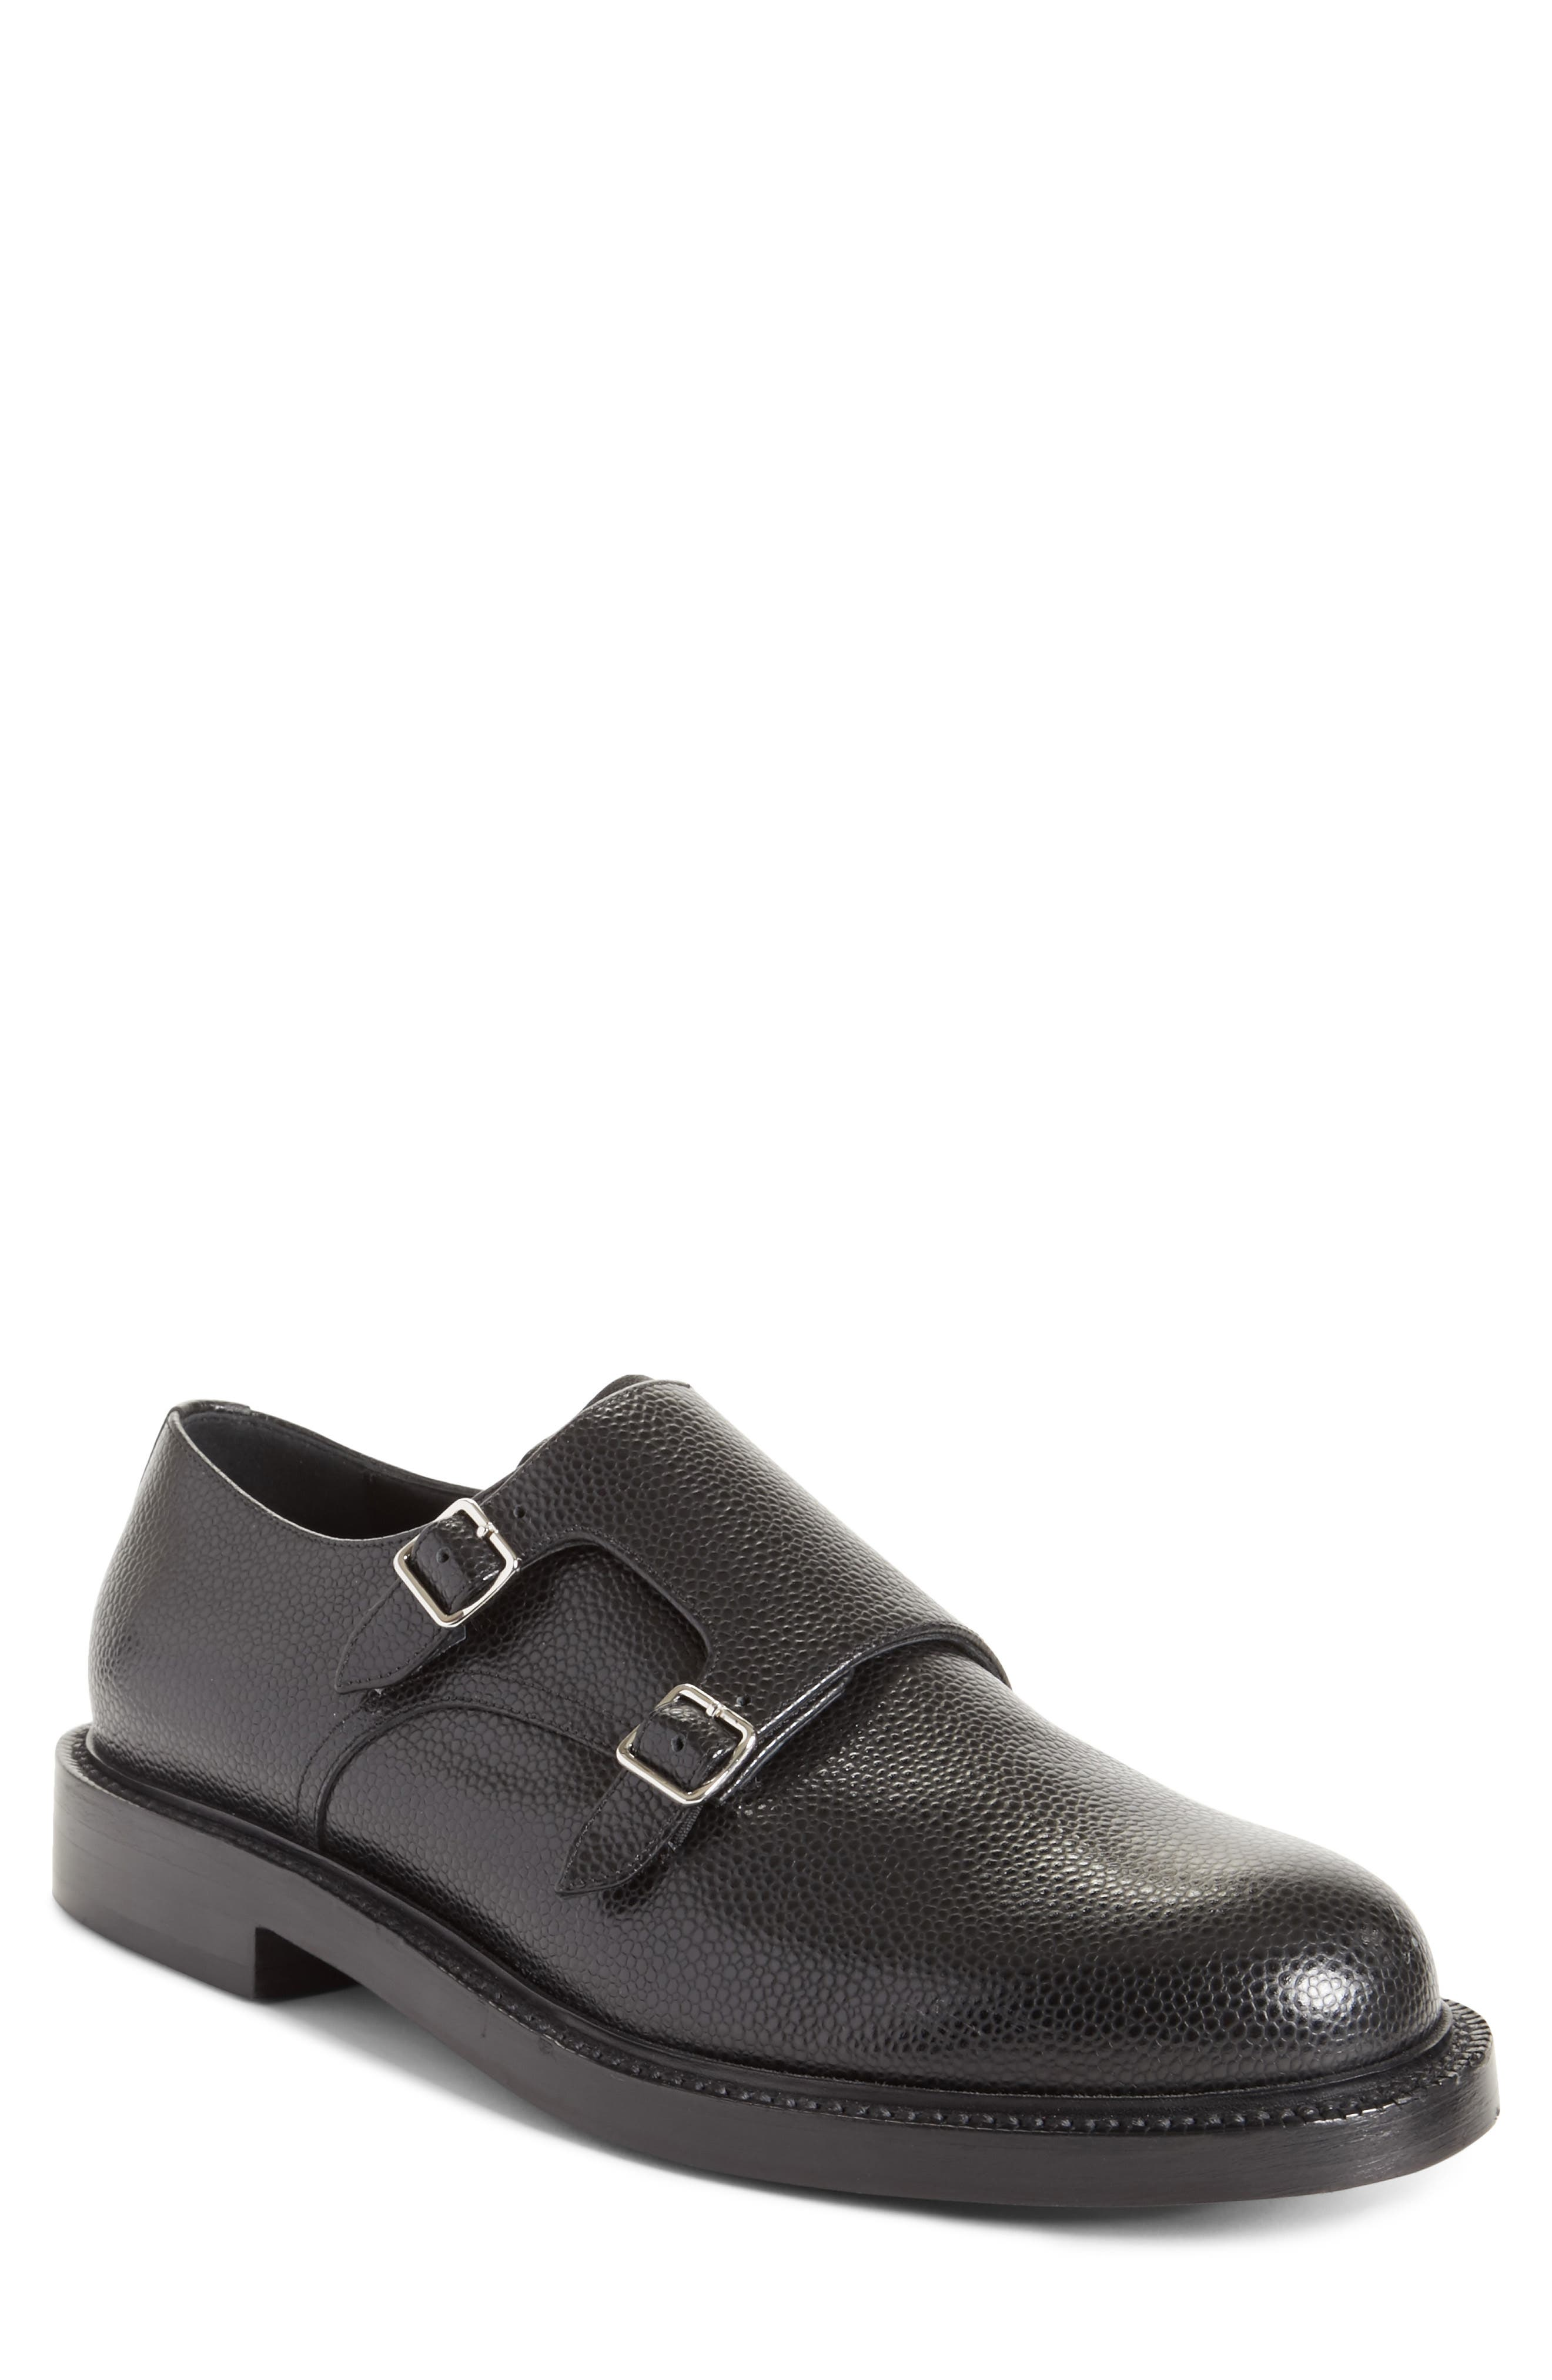 Alternate Image 1 Selected - Calvin Klein 205W39NYC Hova Double Monk Strap Shoe (Men)